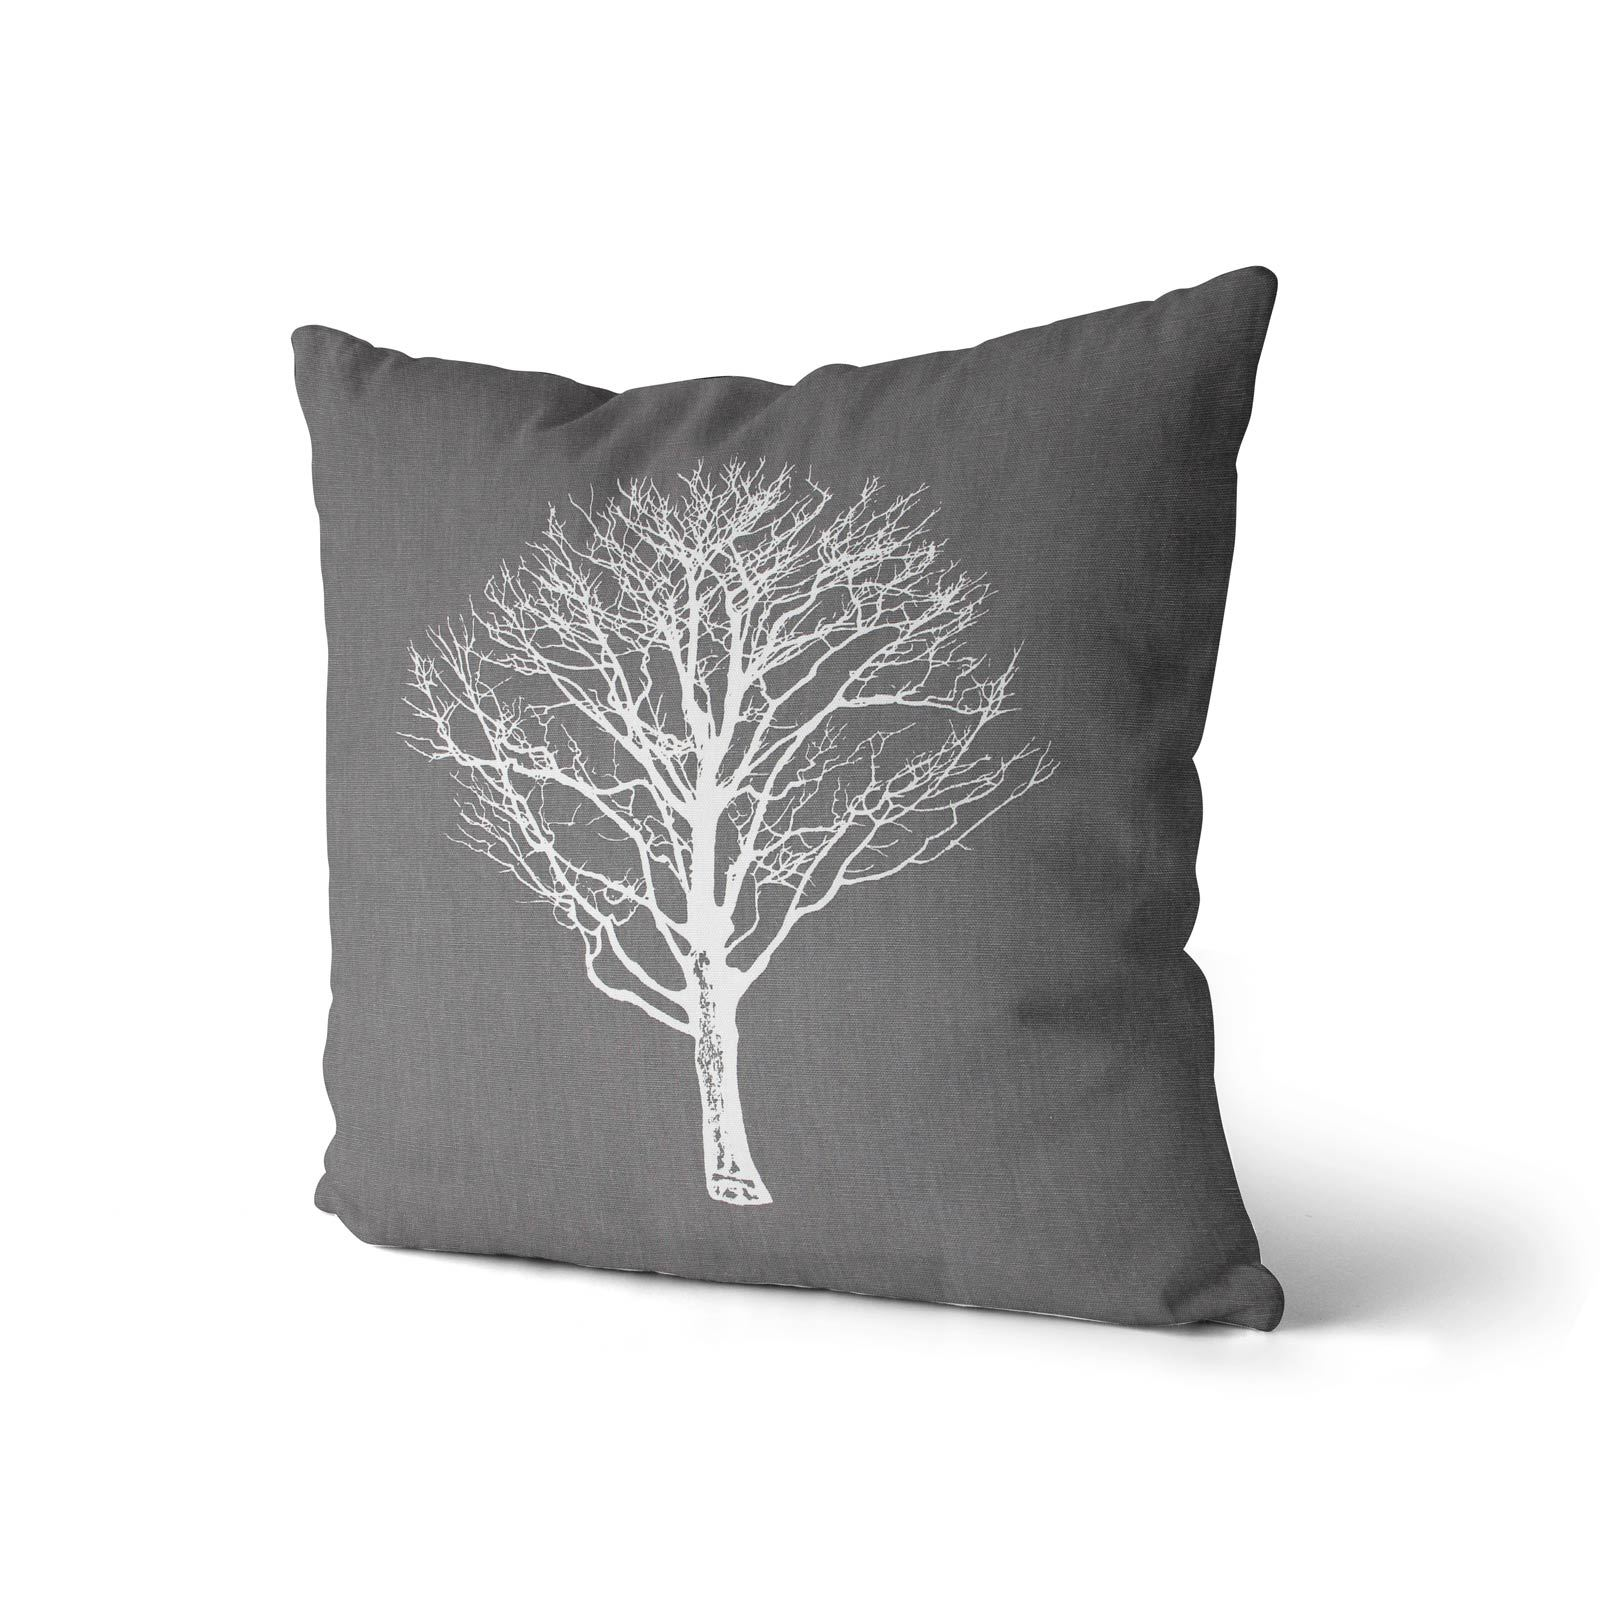 Woodland-Trees-Cushion-Cover-Modern-Reversible-Tree-Print-Covers-17-034-x-17-034 thumbnail 6